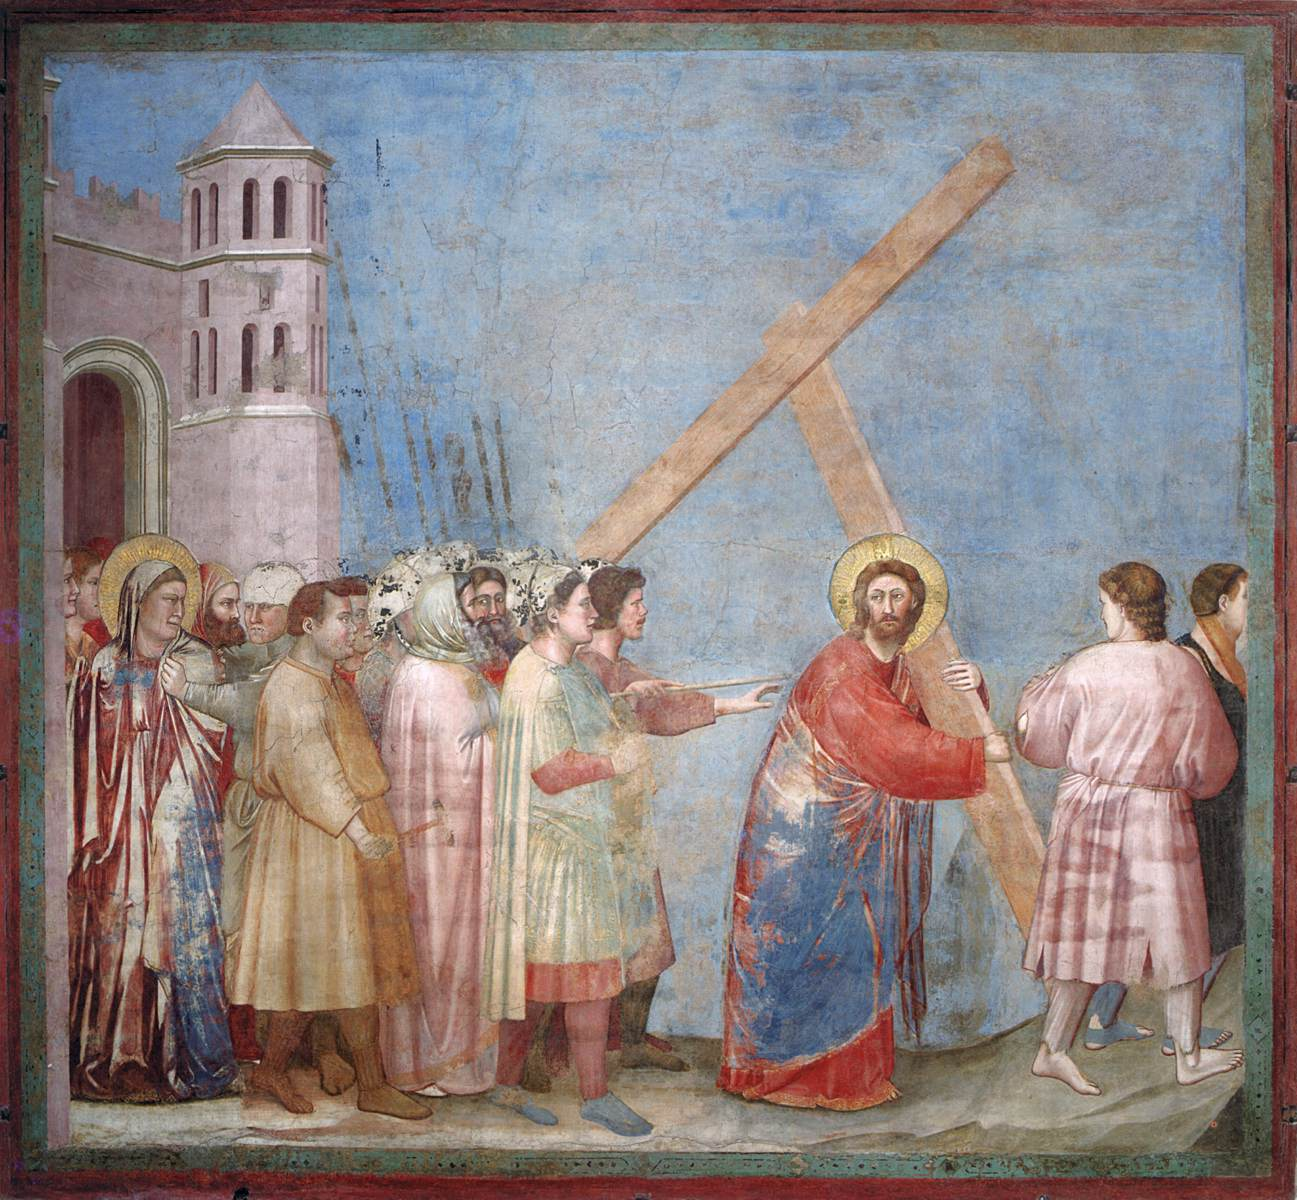 İsa'nın Çilesi - Giotto 14.yy